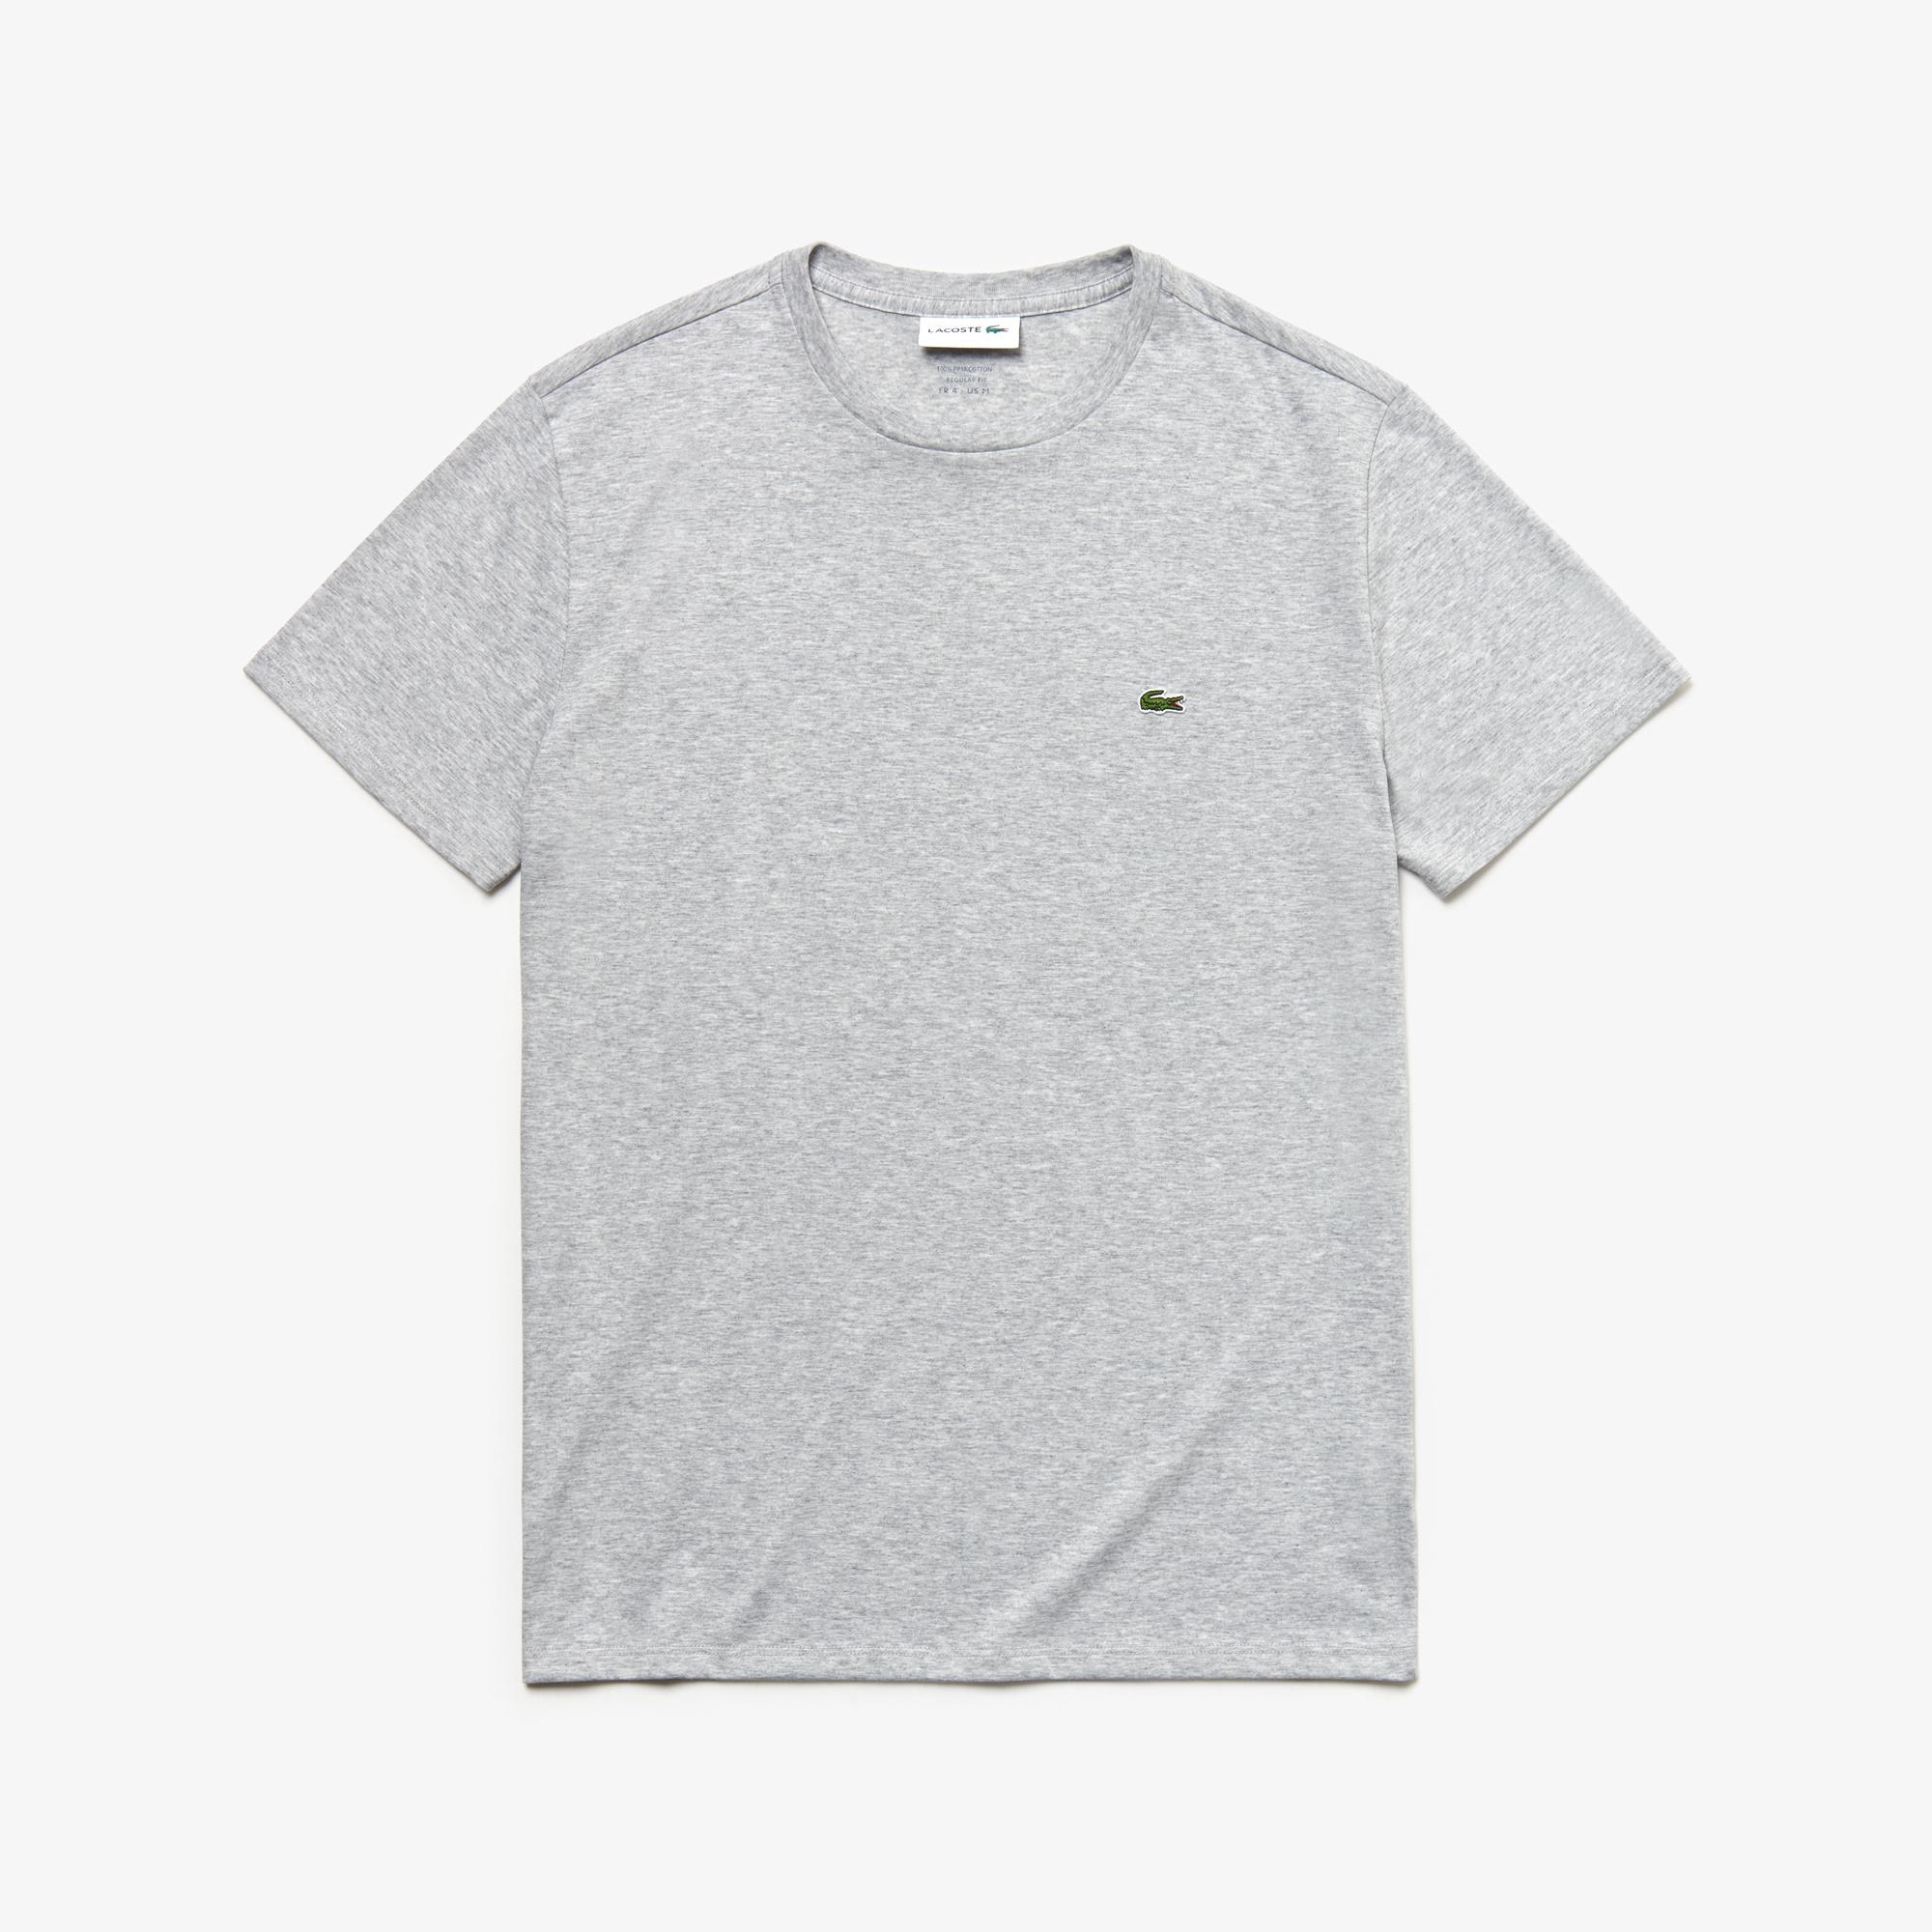 LACOSTE t-shirt col rond coton-4